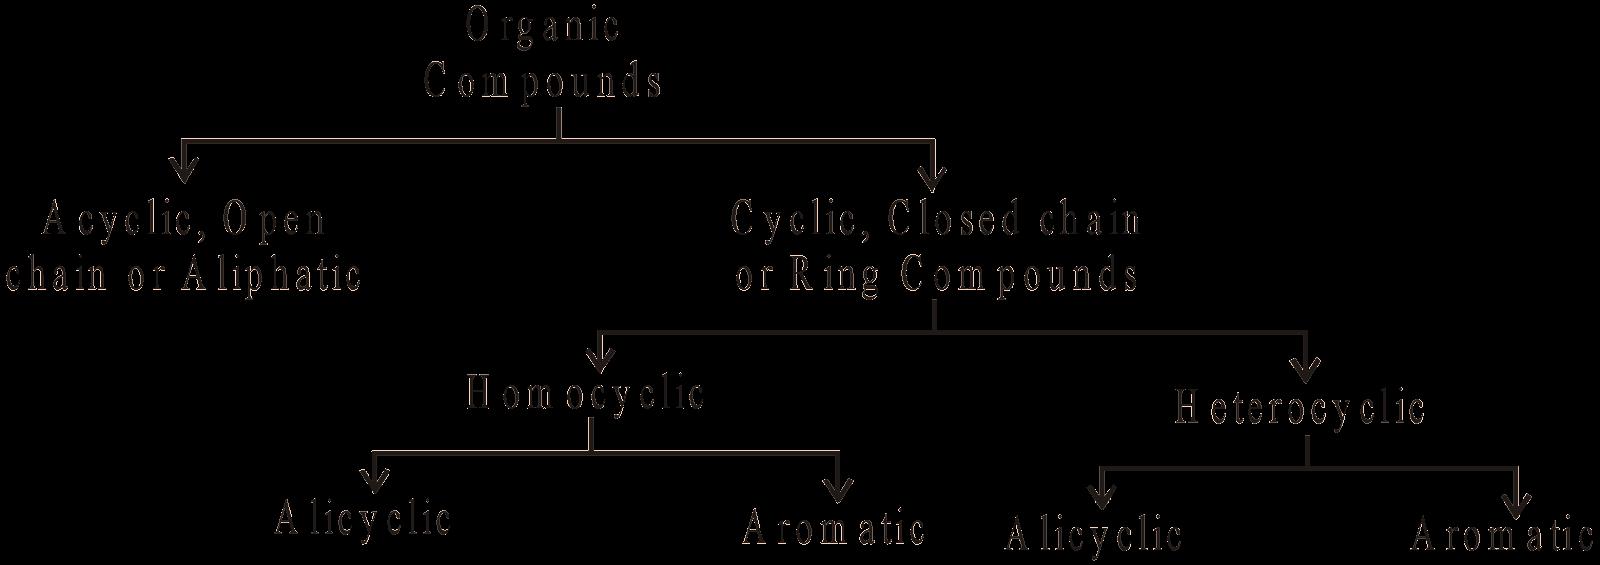 Classification & Nomenclature of Organic Compounds